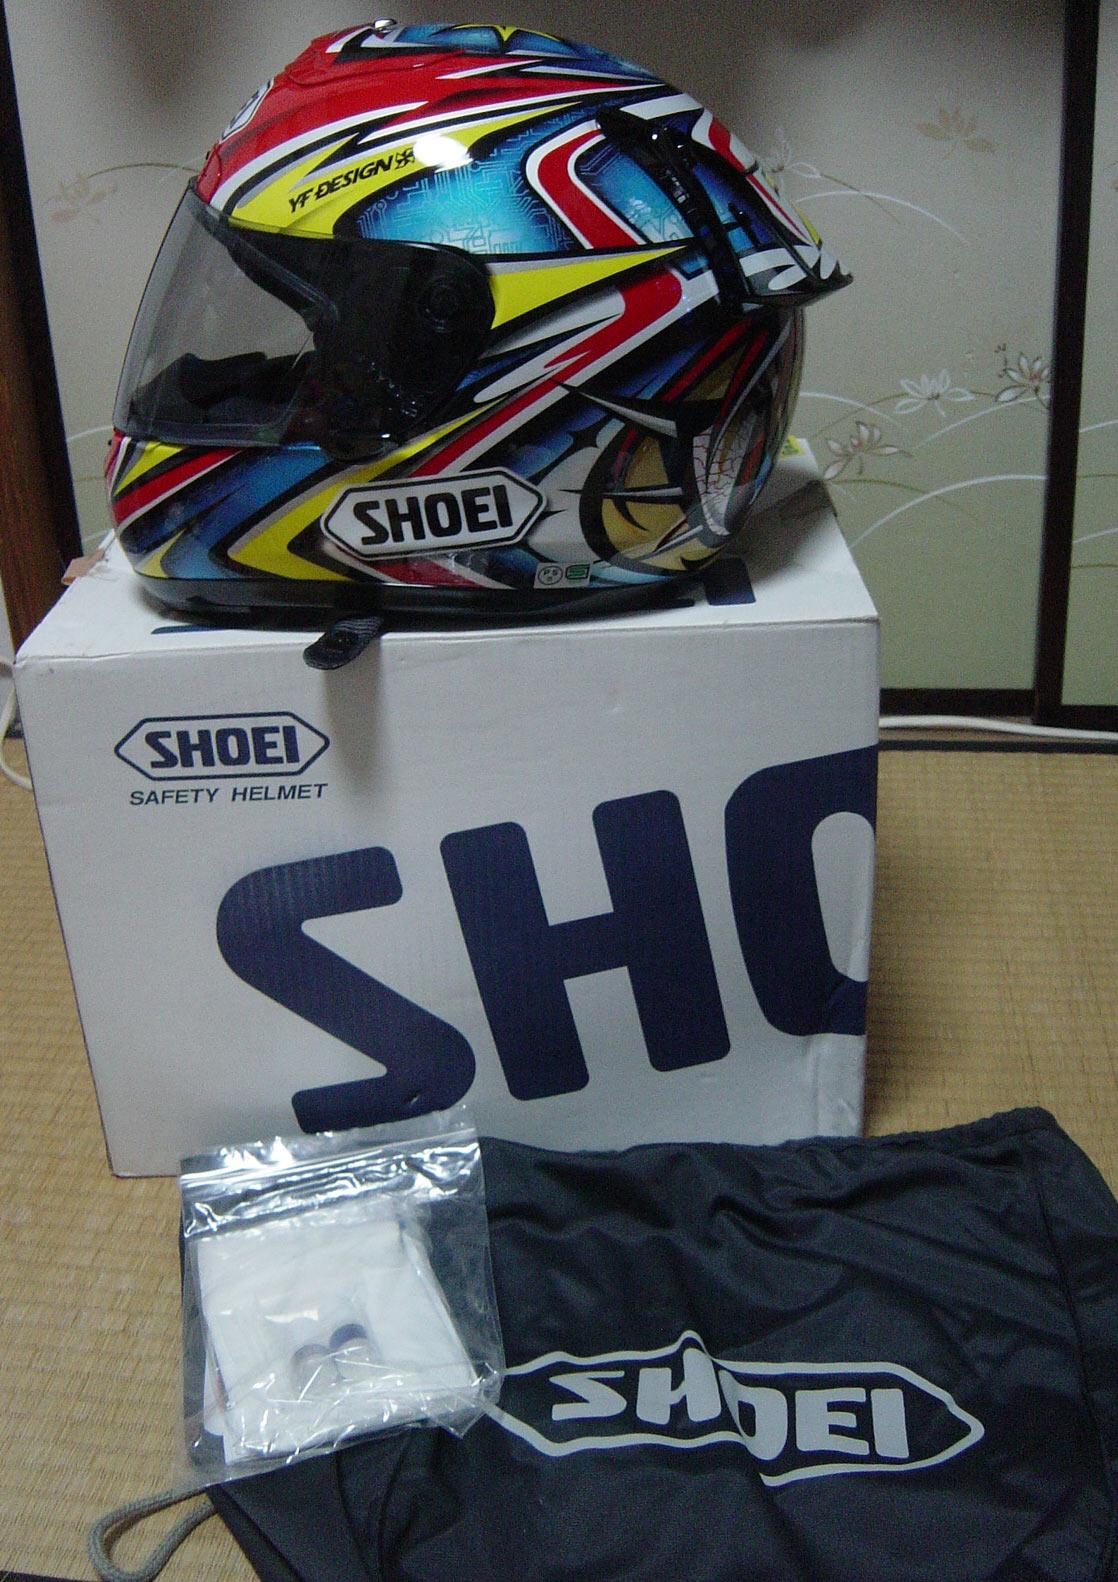 Nsr250 Forums View Topic New Shoei Daijiro Kato Helmet